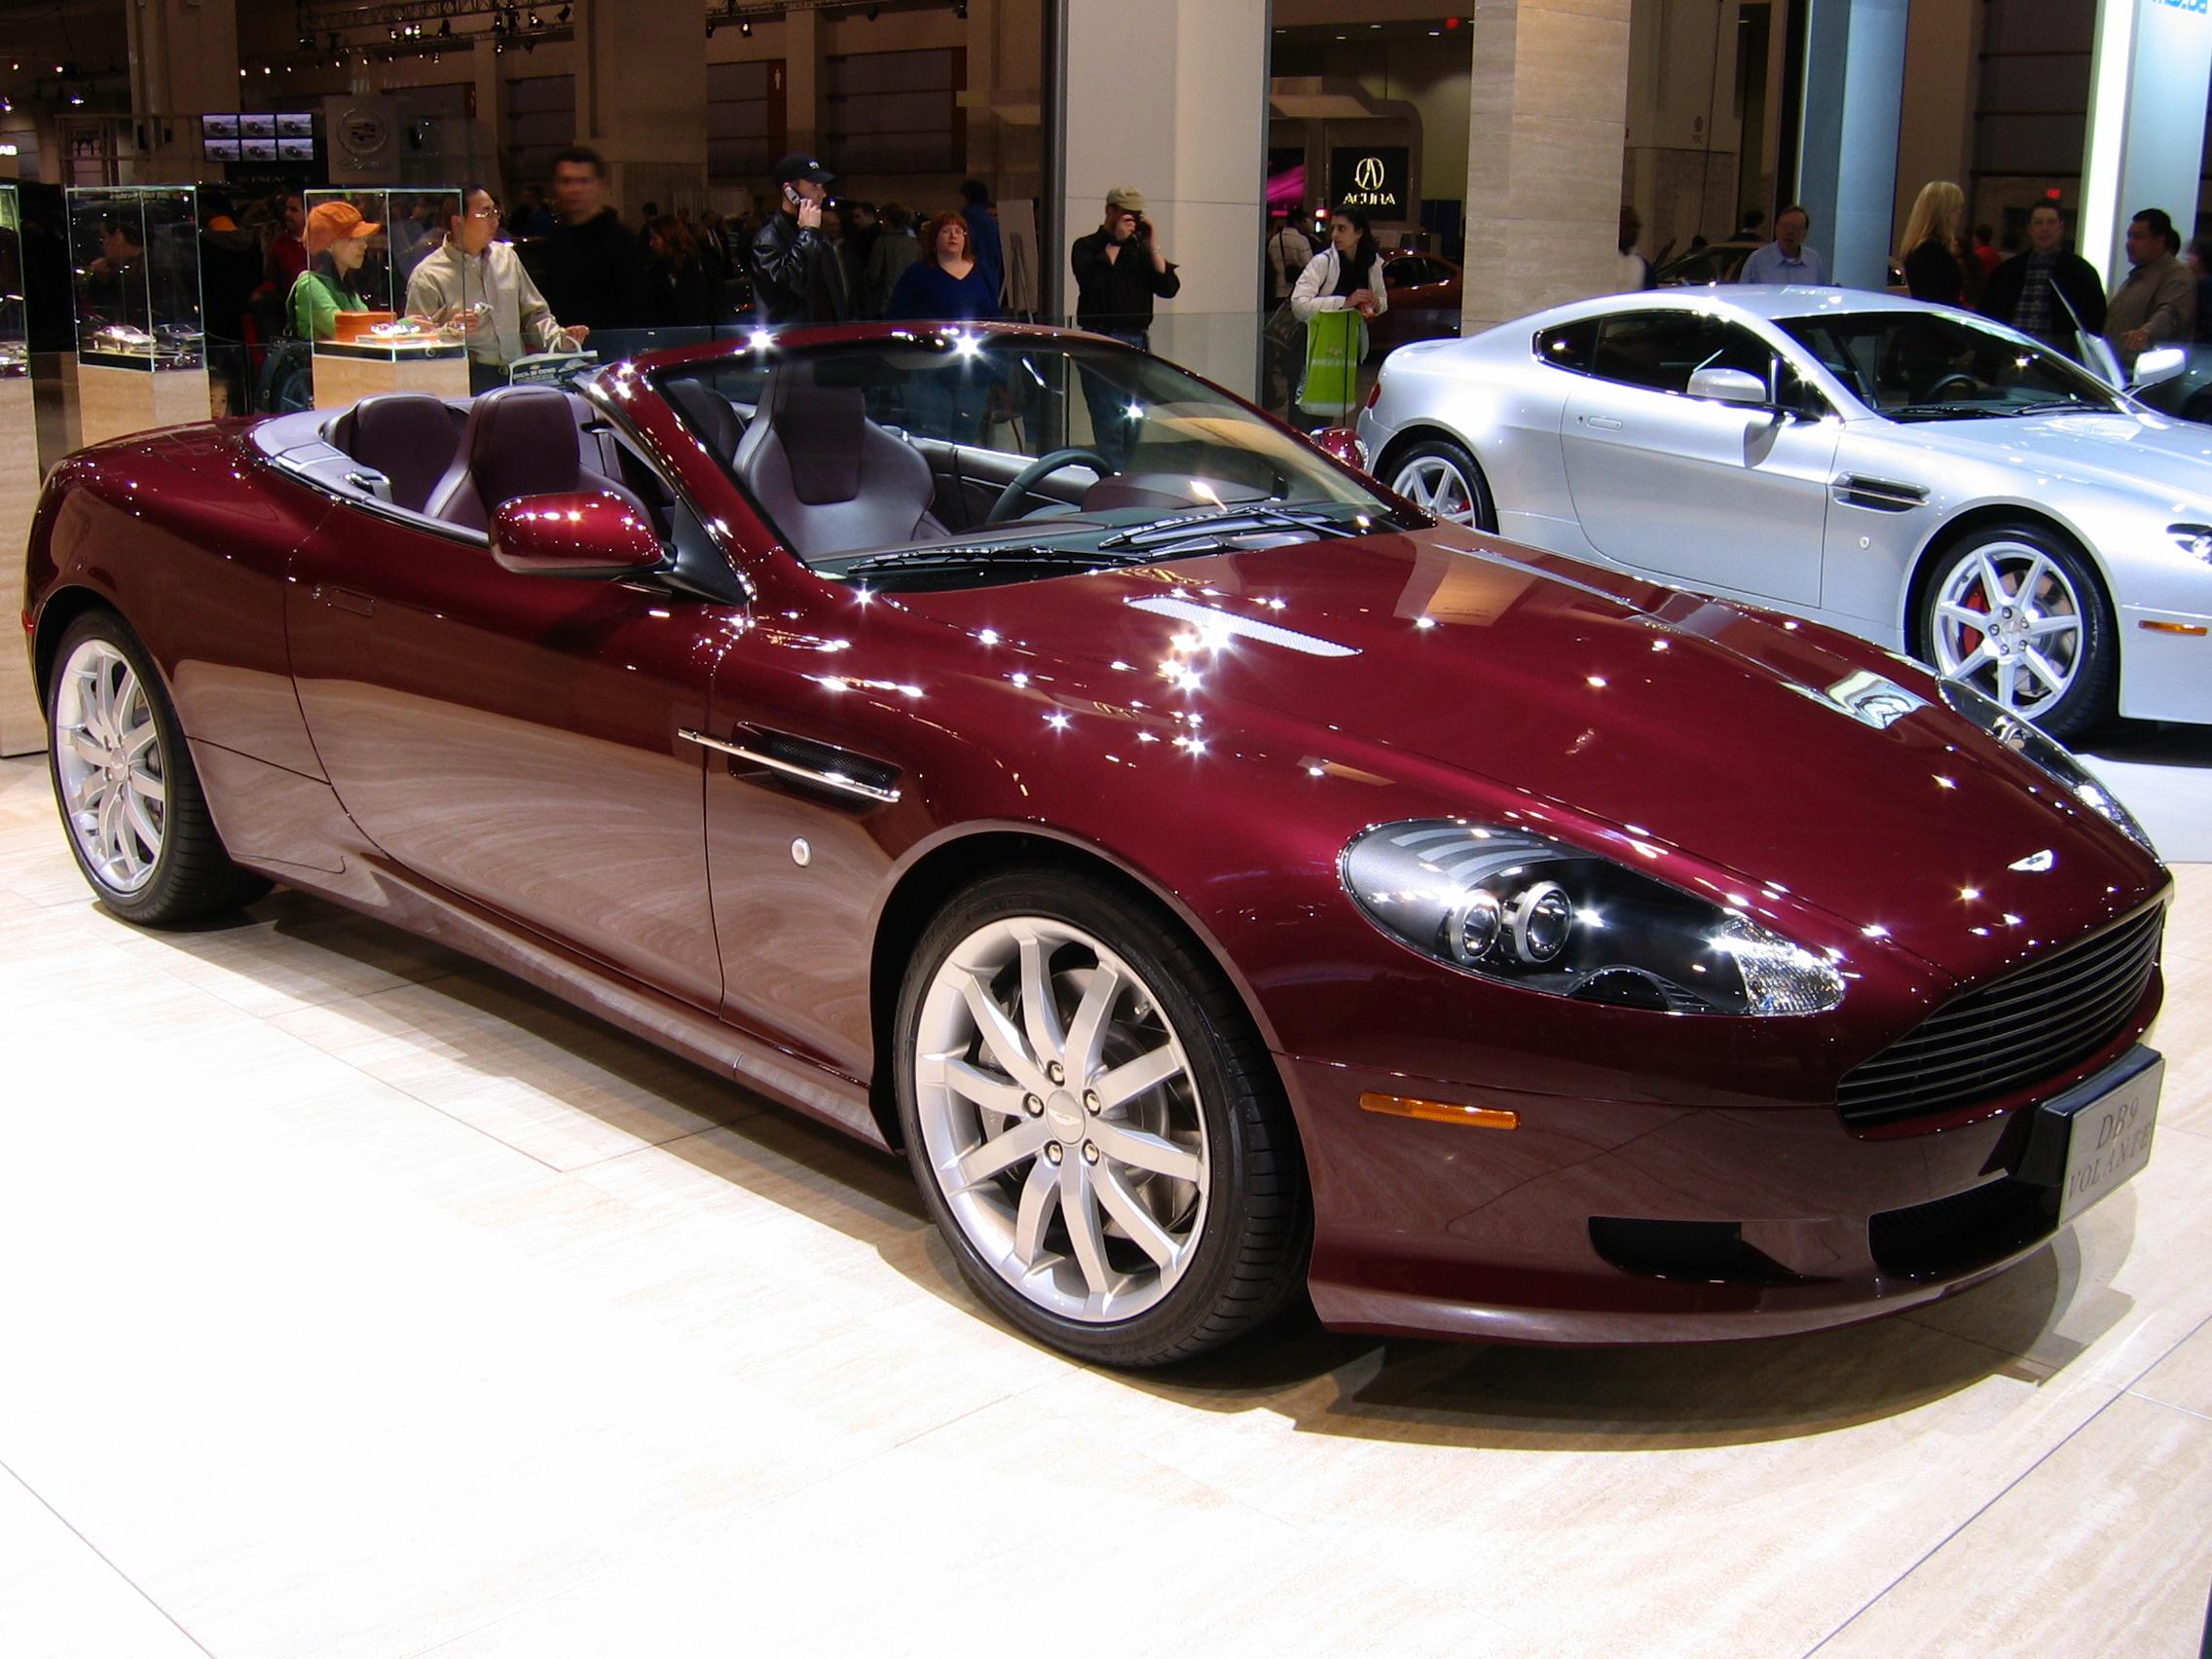 FileWashauto Aston Martin DB Volantejpg Wikimedia Commons - 2006 aston martin db9